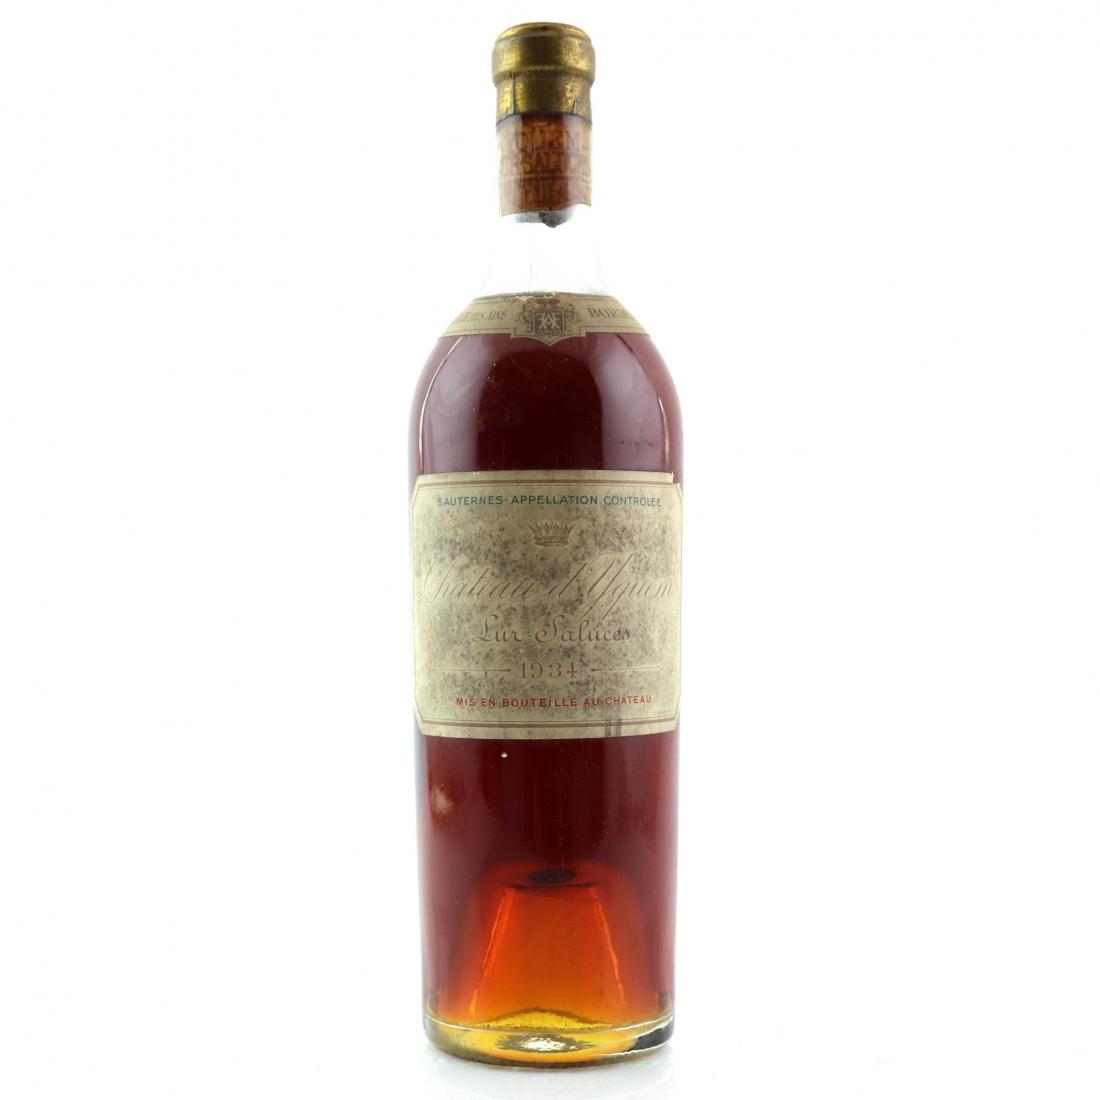 Ch. d'Yquem 1934 Sauternes 1er-Cru-Superior